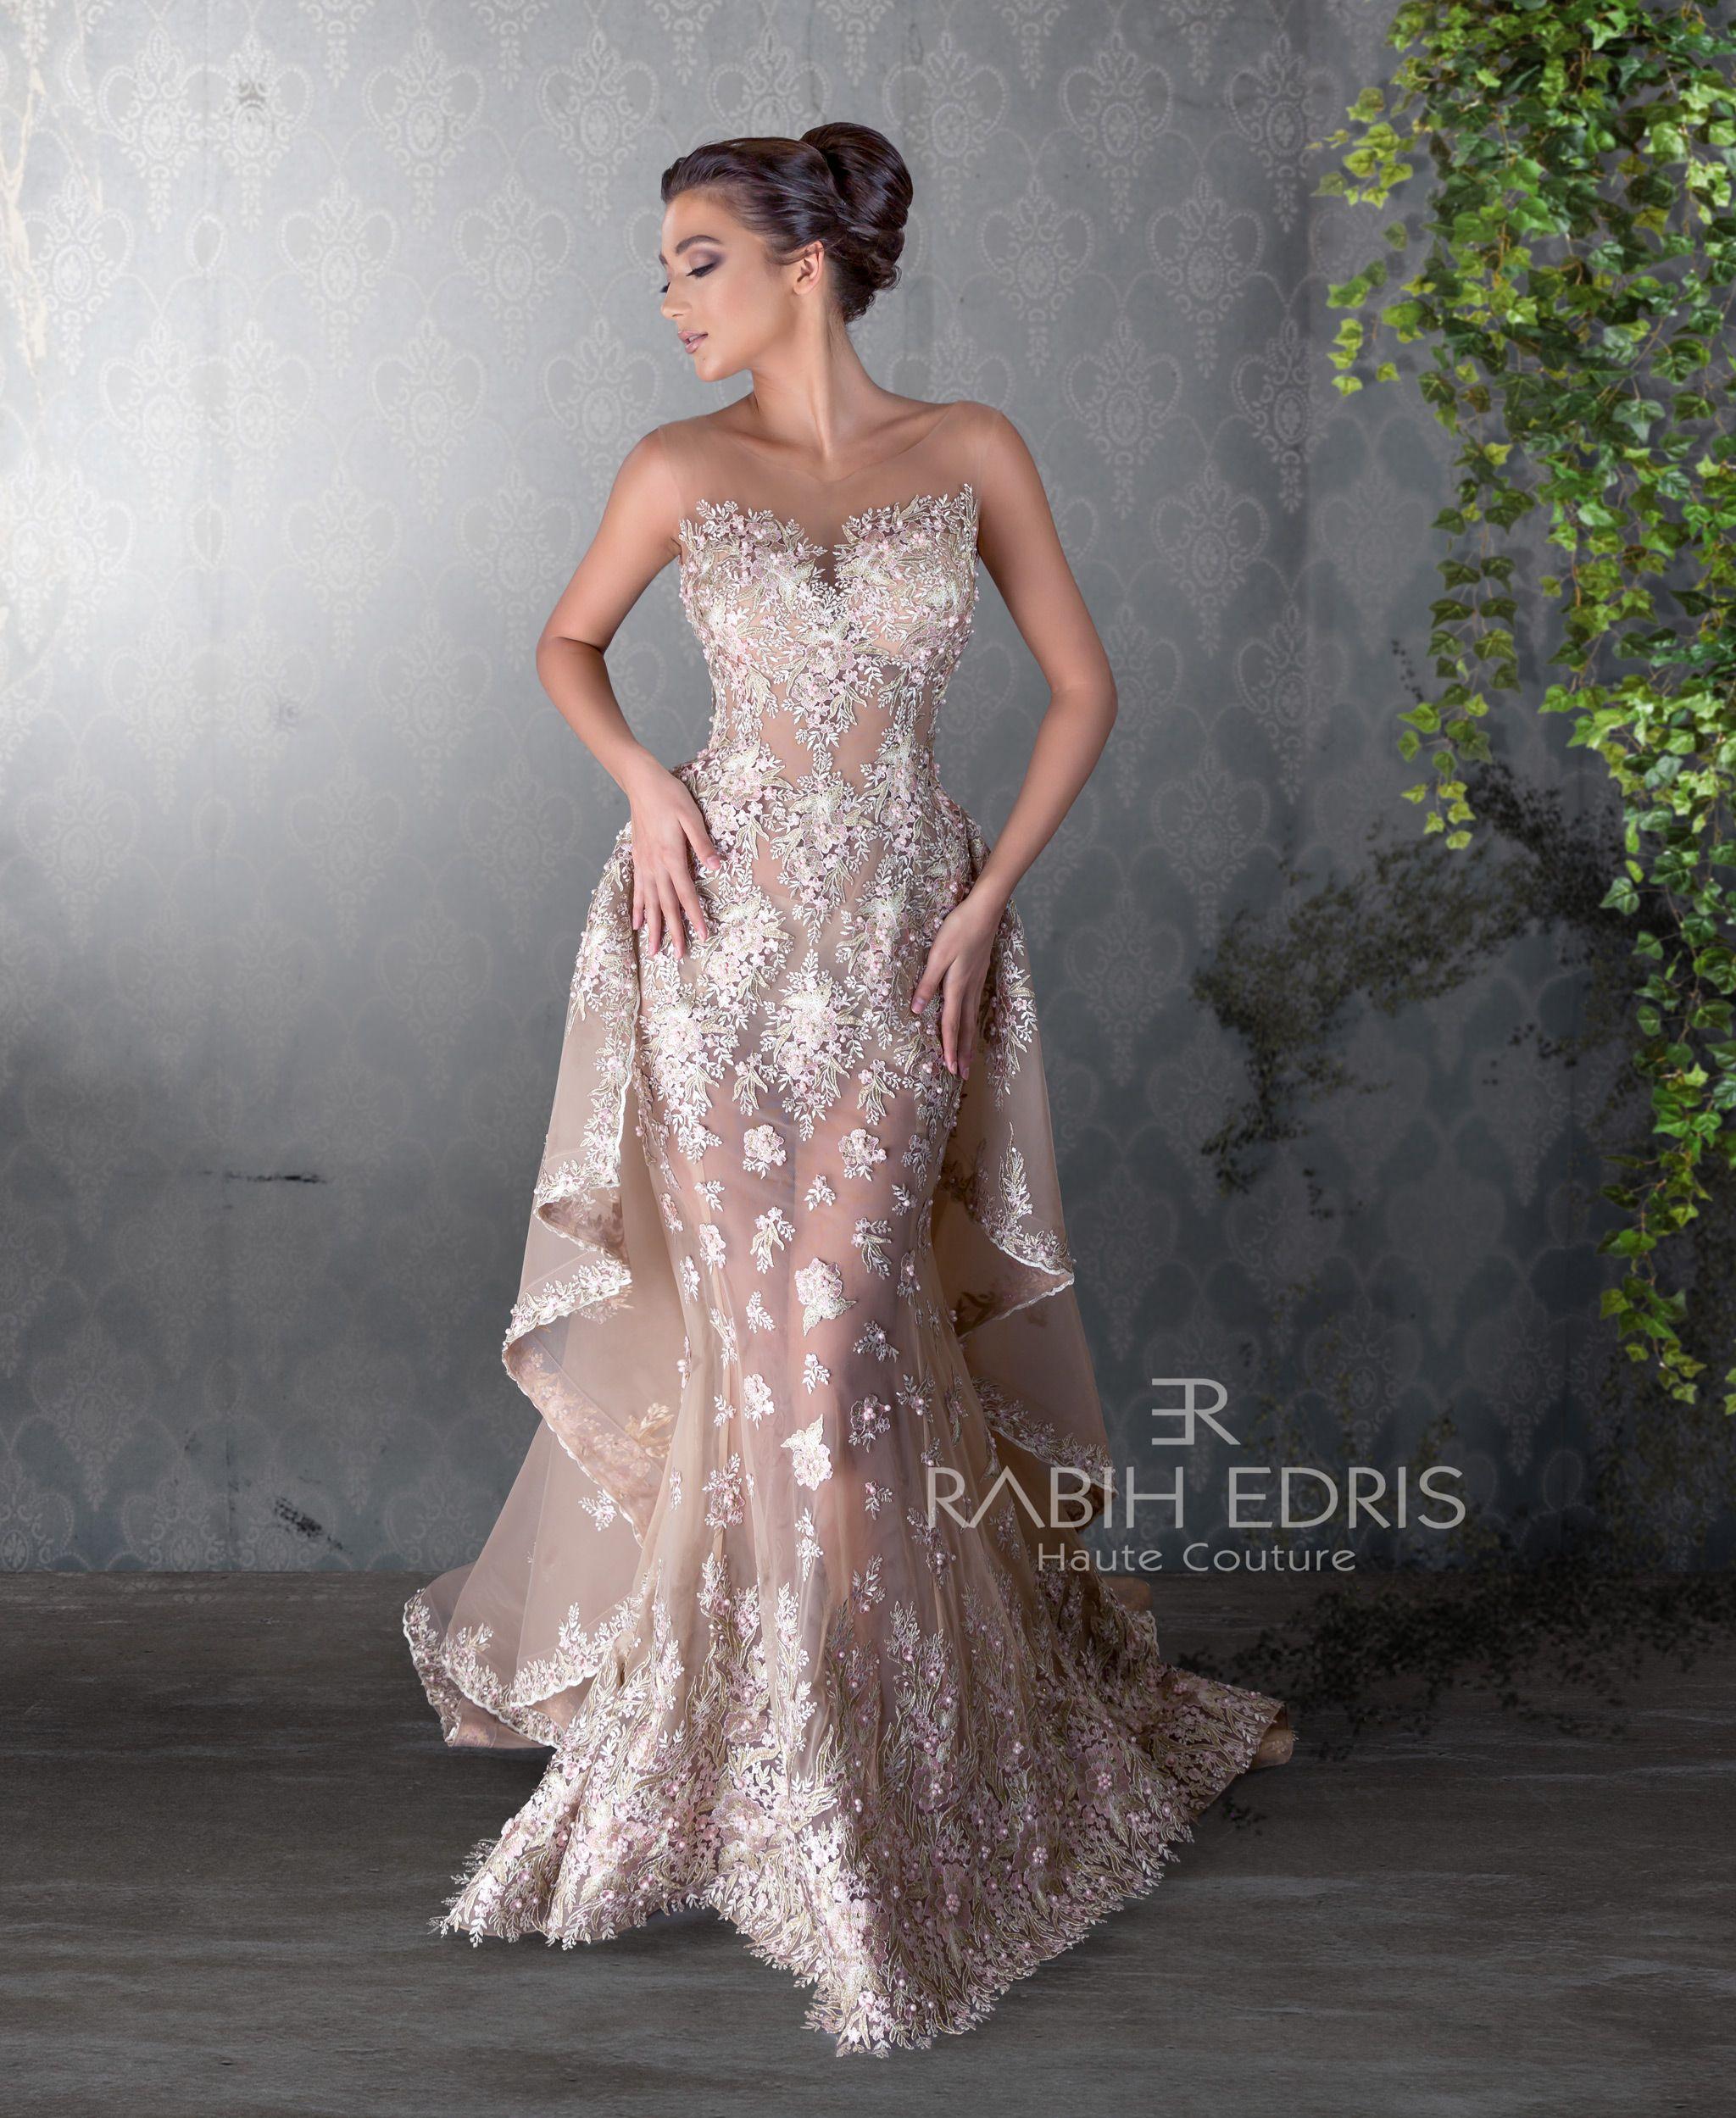 Rose gold evening dress rabih edris ss photo shoot pinterest